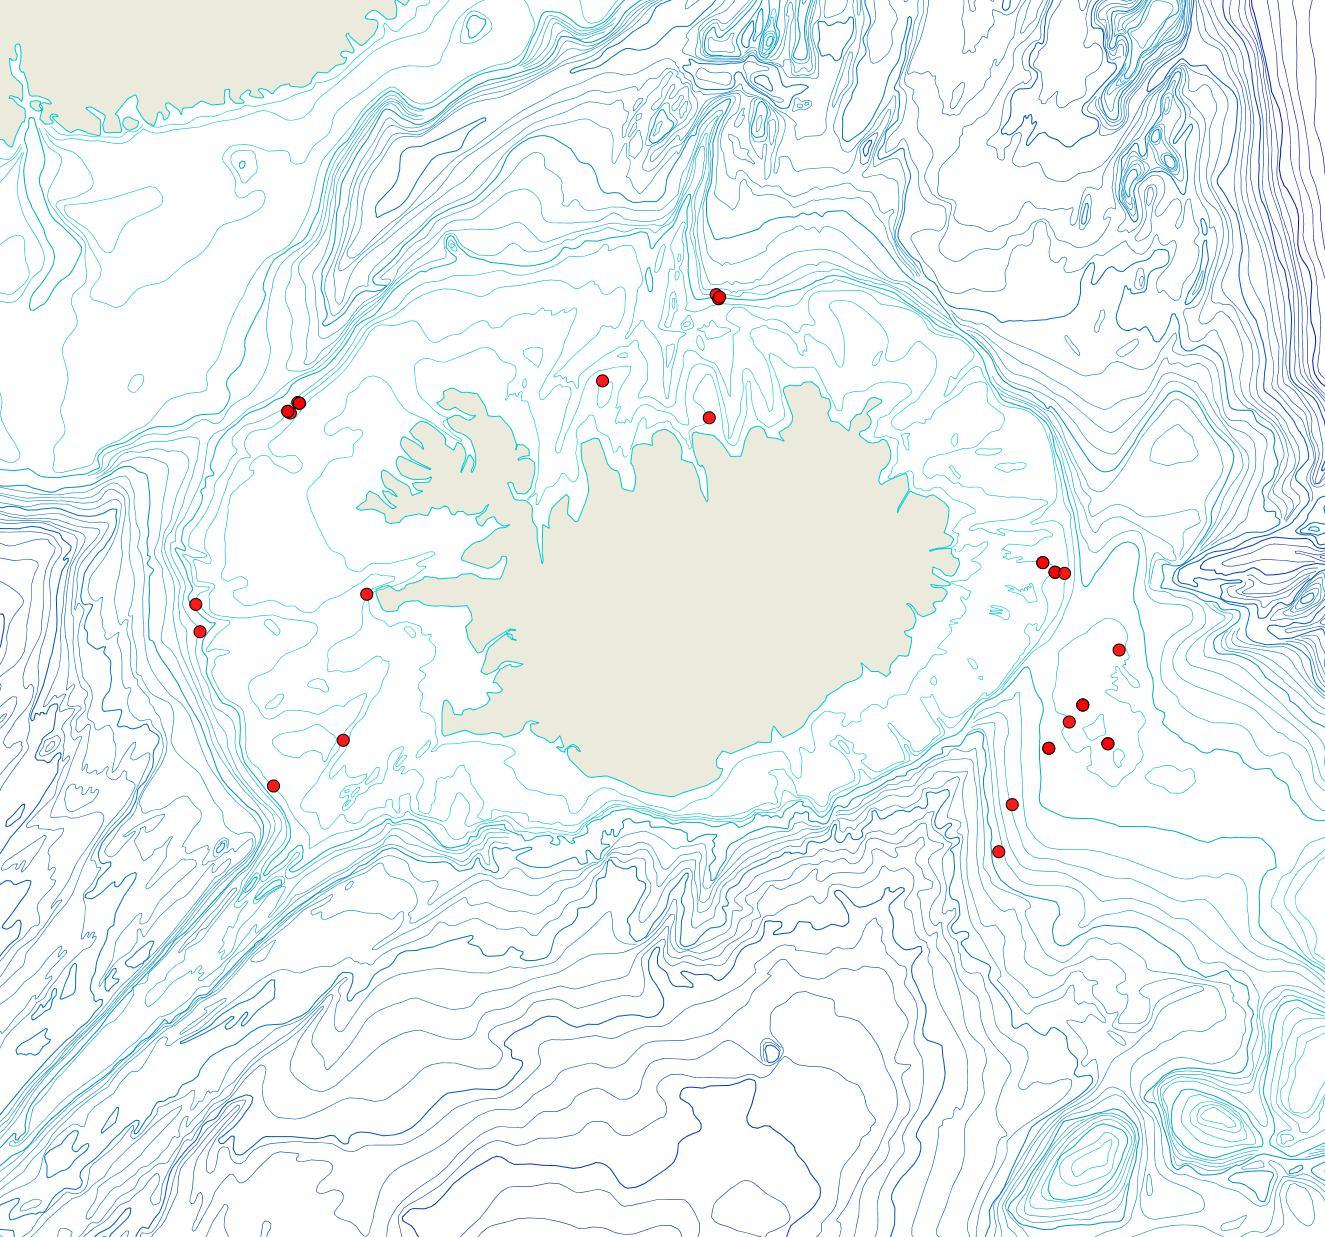 Útbreiðsla Oncousoecia dilatans(Bioice samples, red dots)